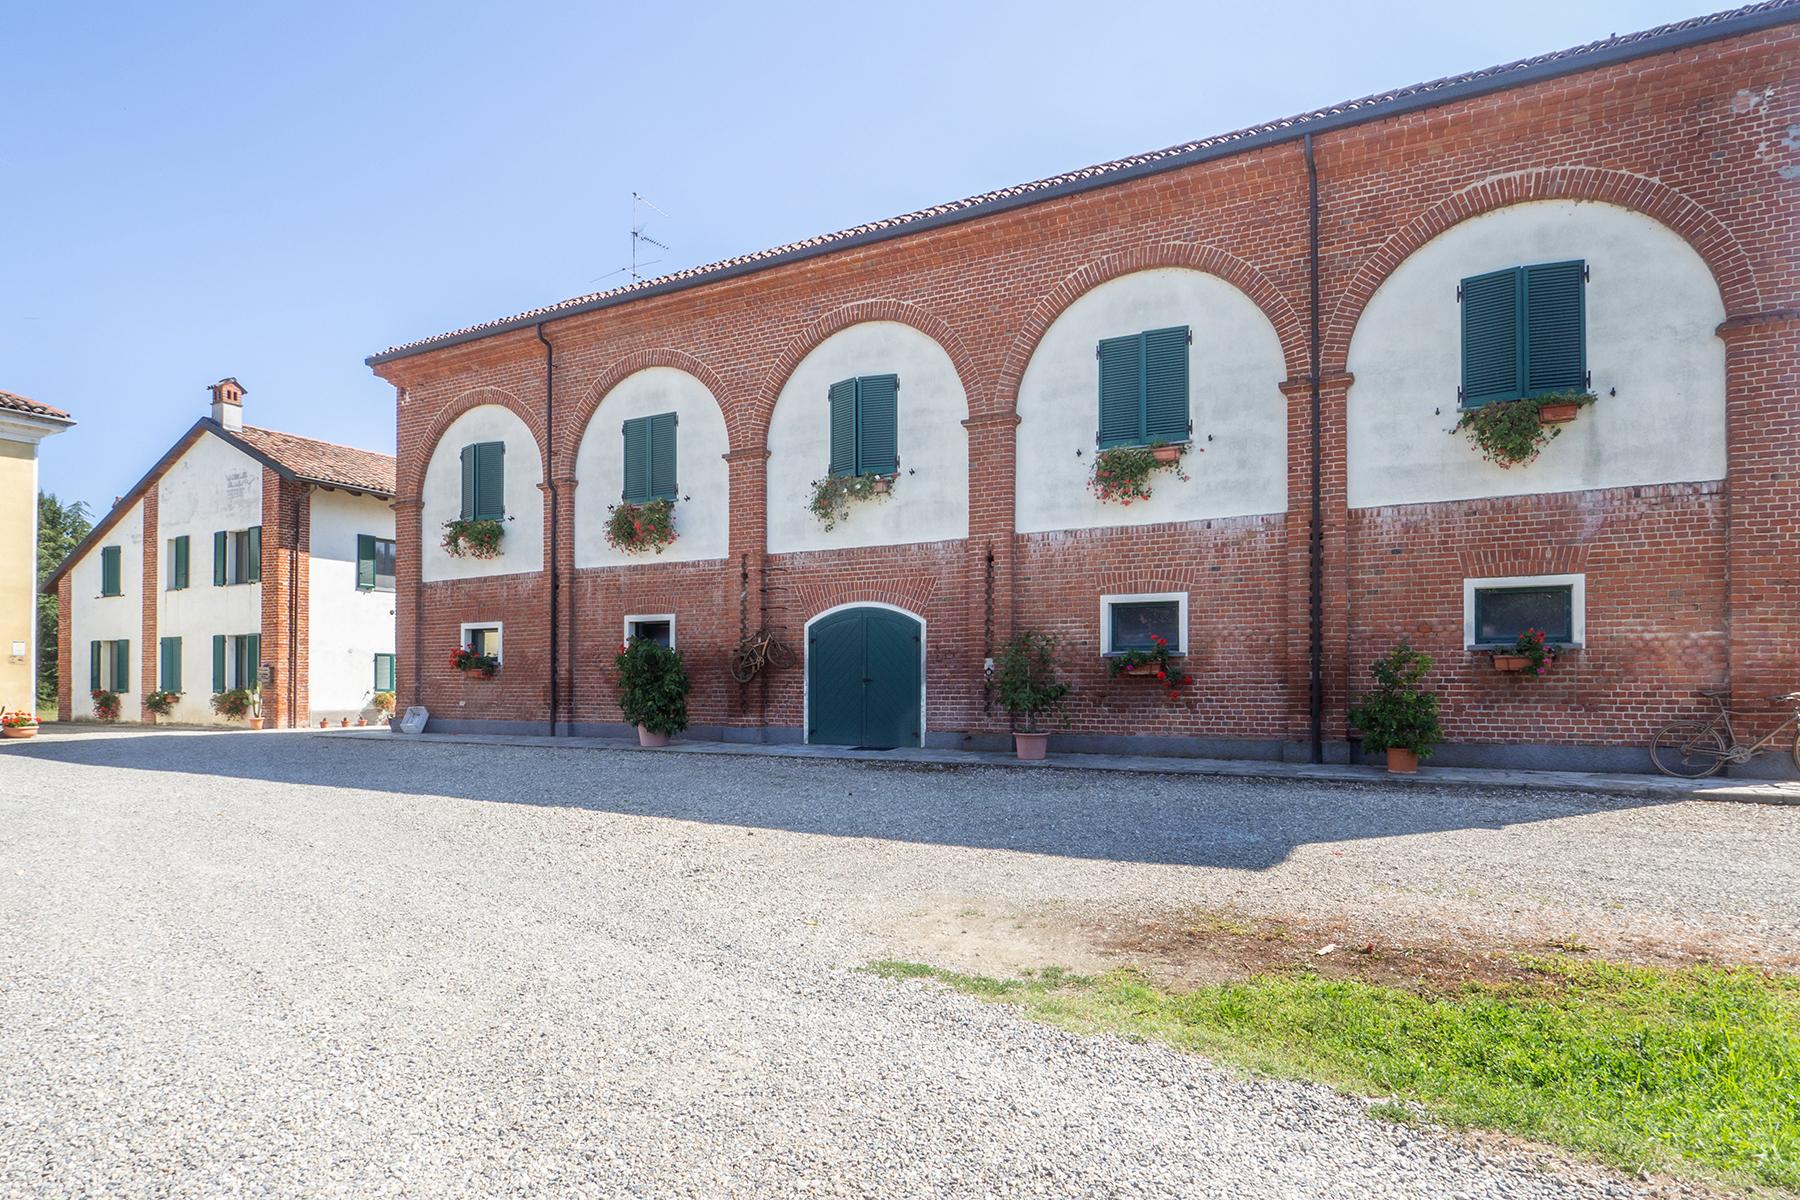 Rustico in Vendita a Valenza: 5 locali, 1800 mq - Foto 4